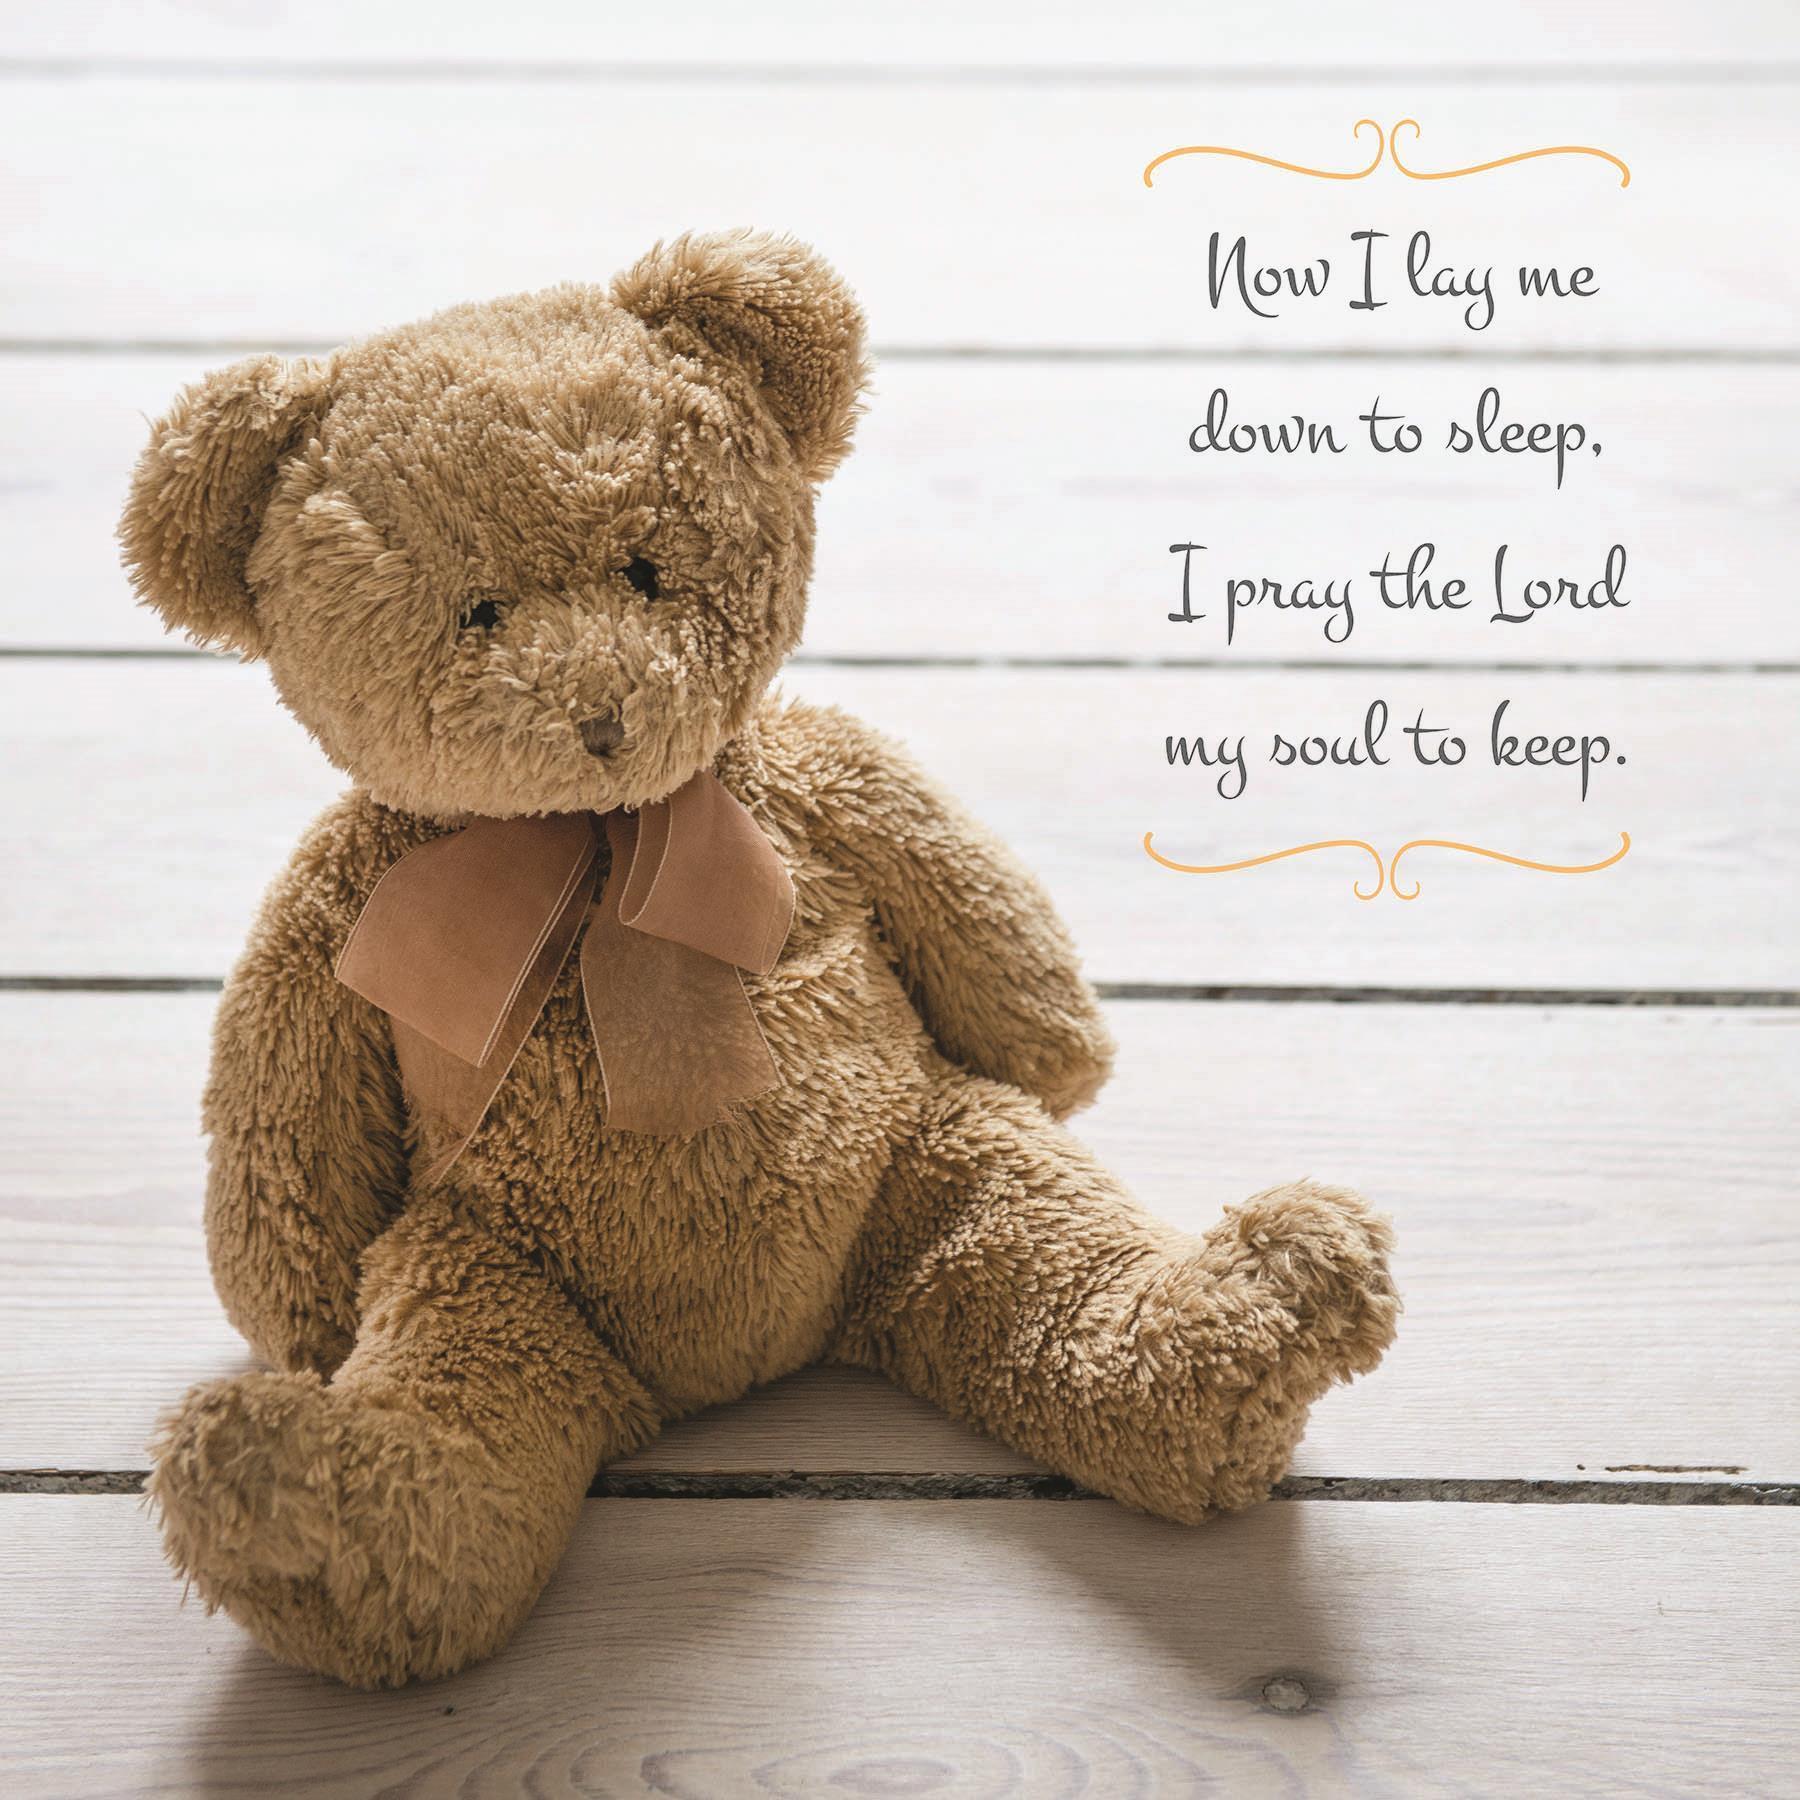 American Made Teddy Bear Scripture Plaque